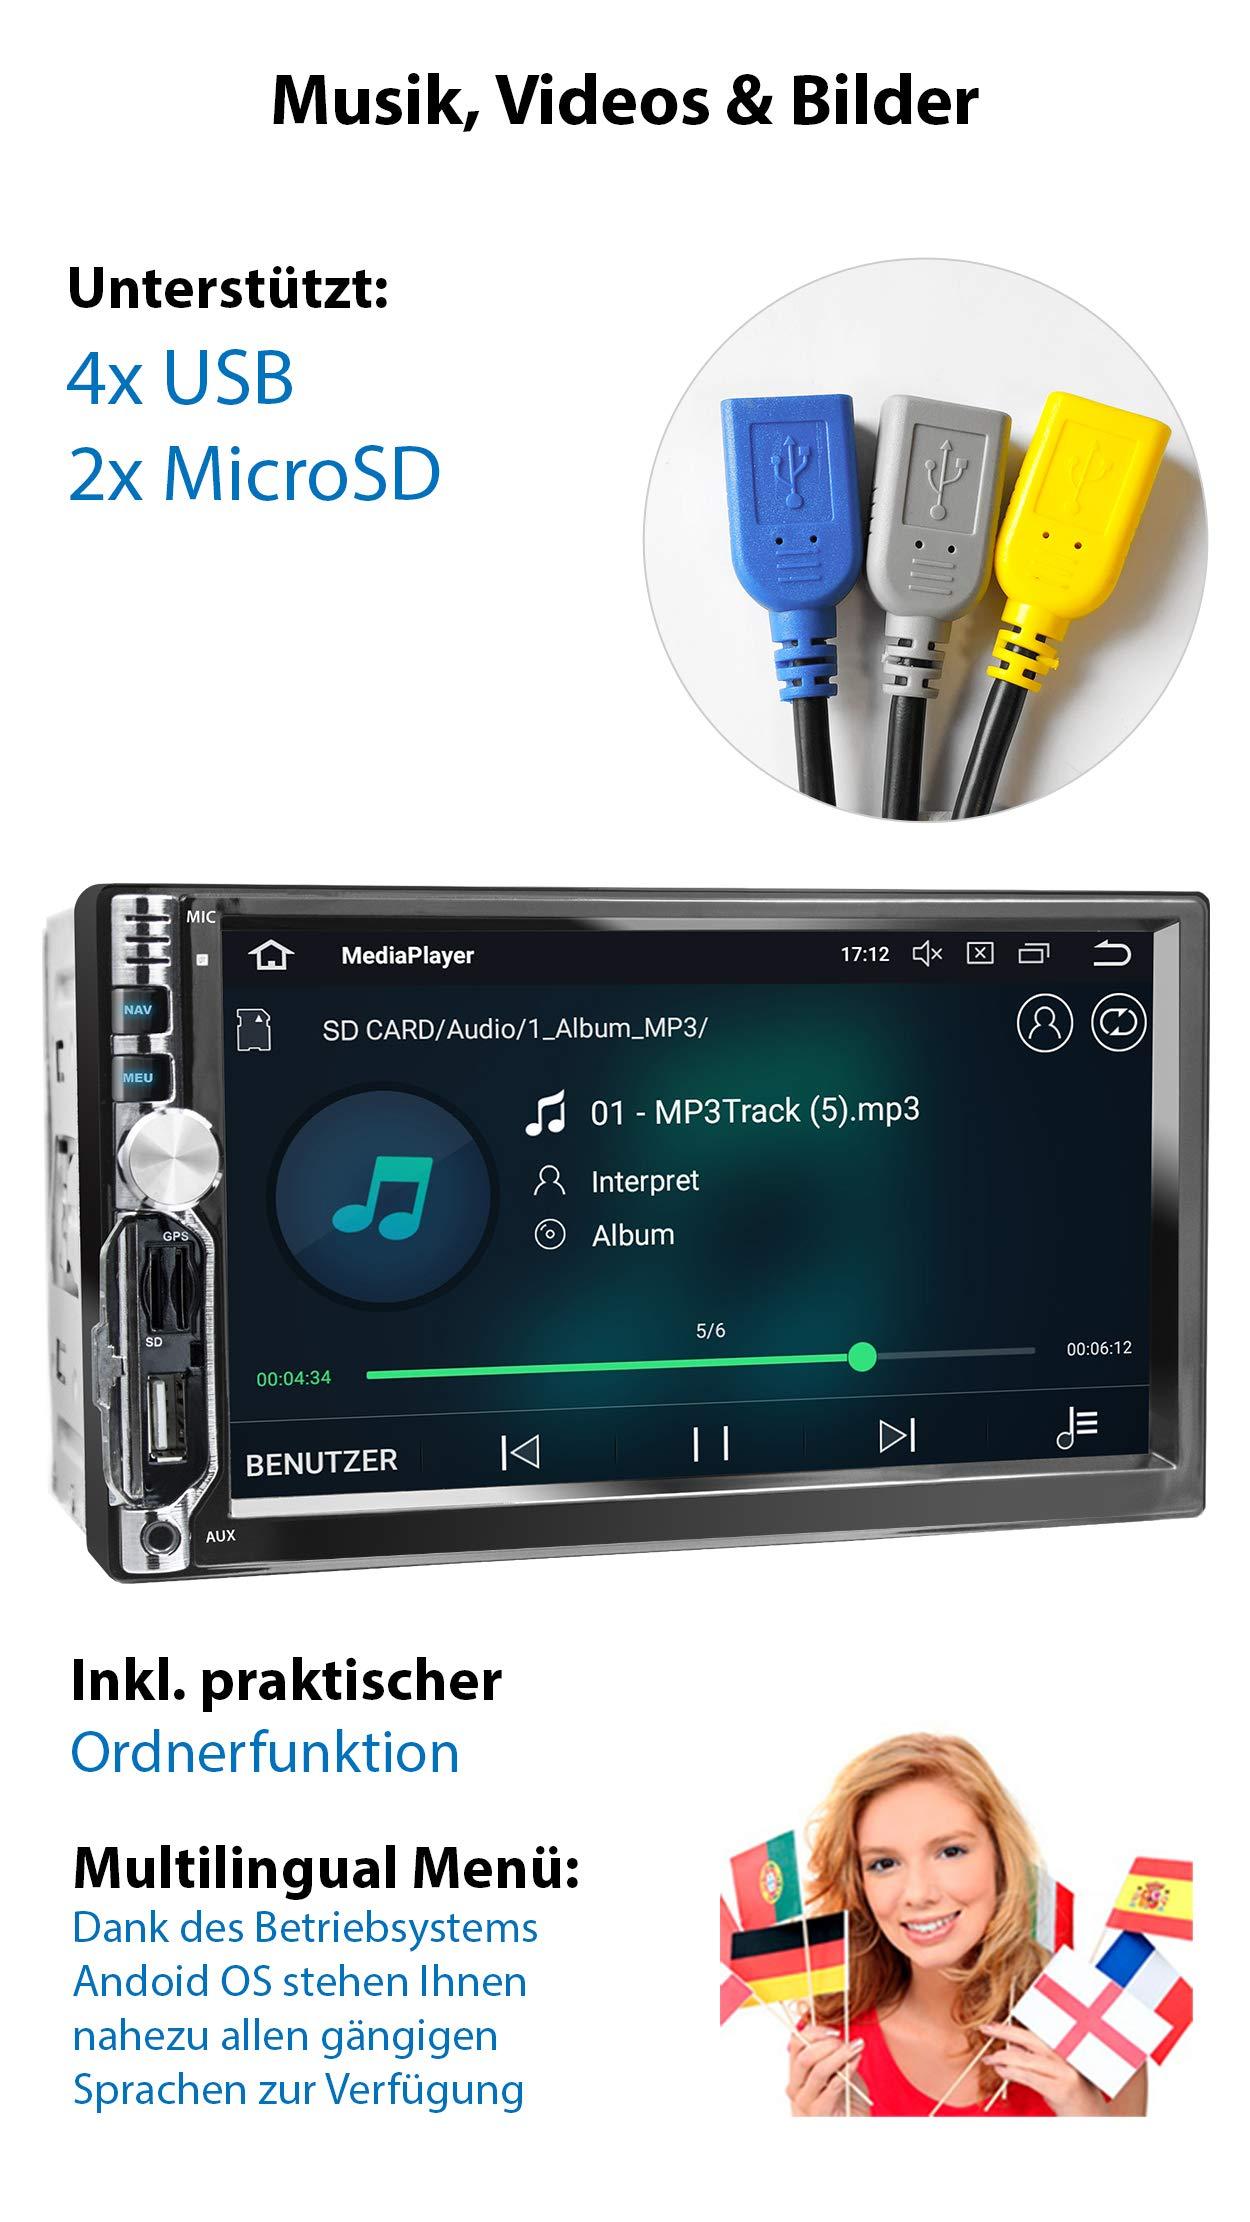 XOMAX-XM-2VA756-Autoradio-mit-Android-81-QuadCore-2GB-RAM-16GB-ROM-GPS-Navigation-I-Support-WiFi-WLAN-3G-4G-DAB-OBD2-I-Bluetooth-7-Zoll-18-cm-Touchscreen-USB-SD-AUX-2-DIN